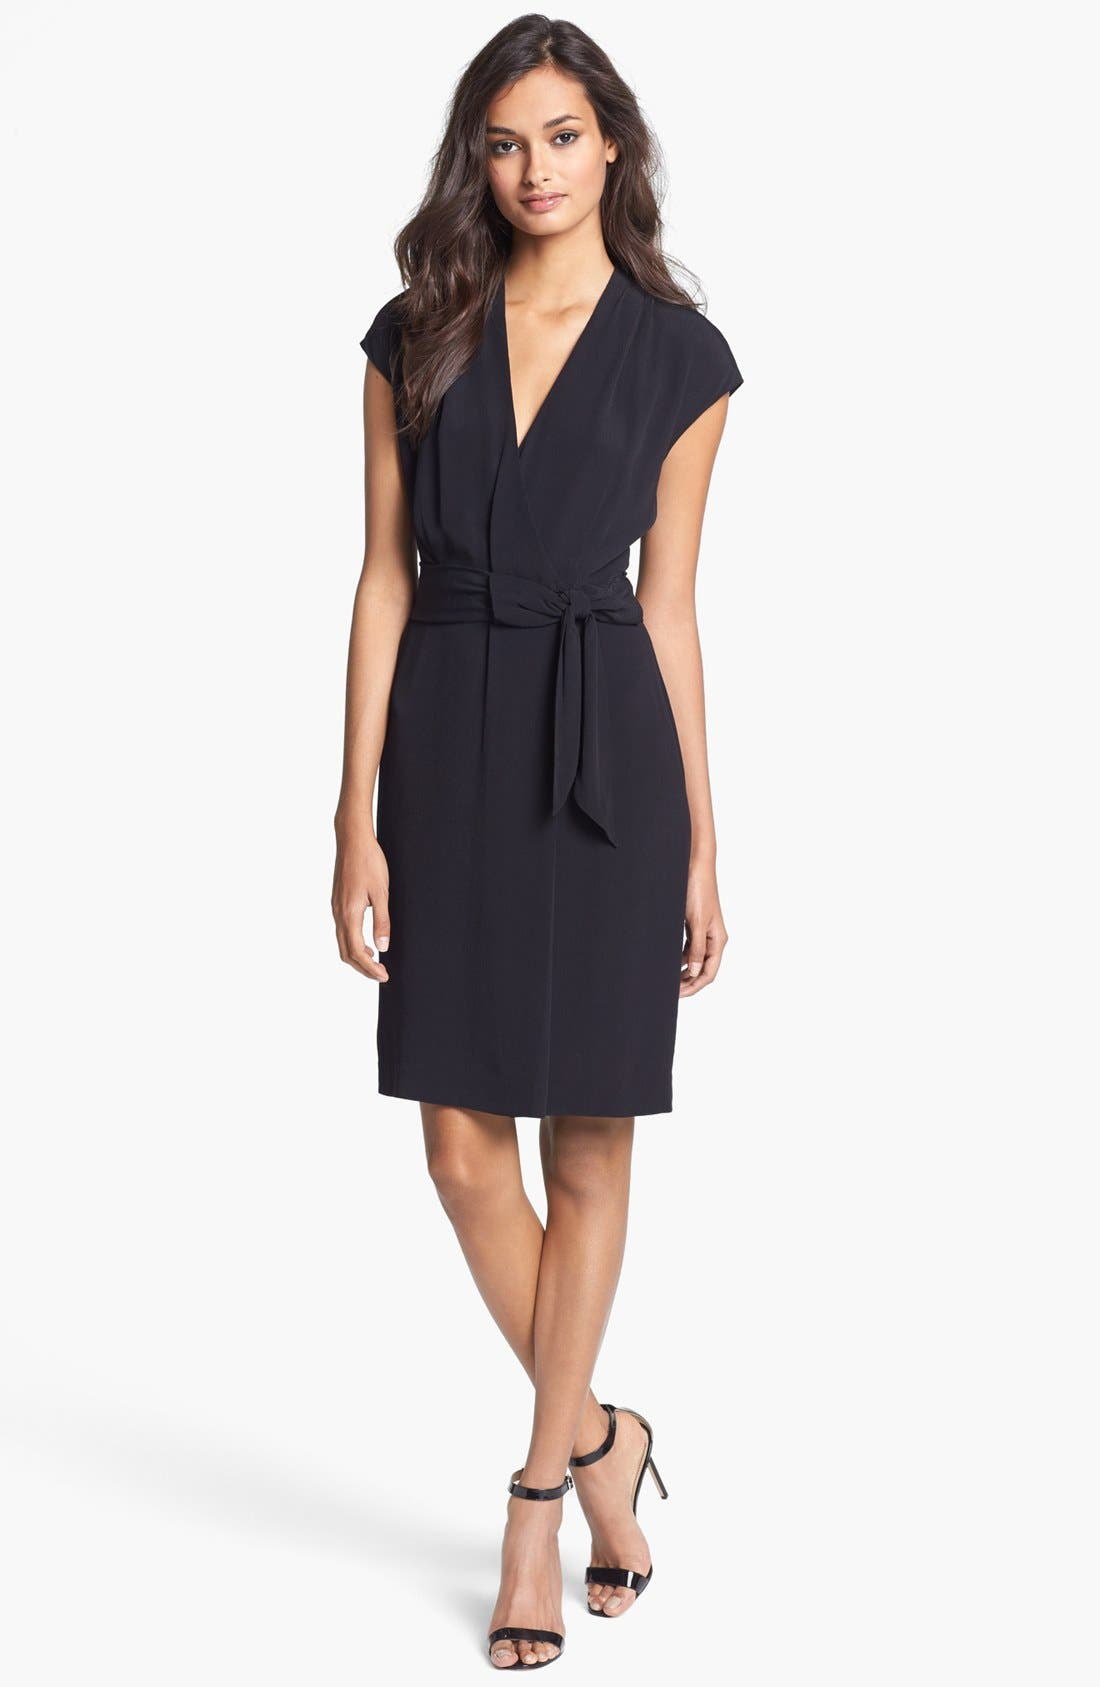 Alternate Image 1 Selected - kate spade new york 'villa' sleeveless dress